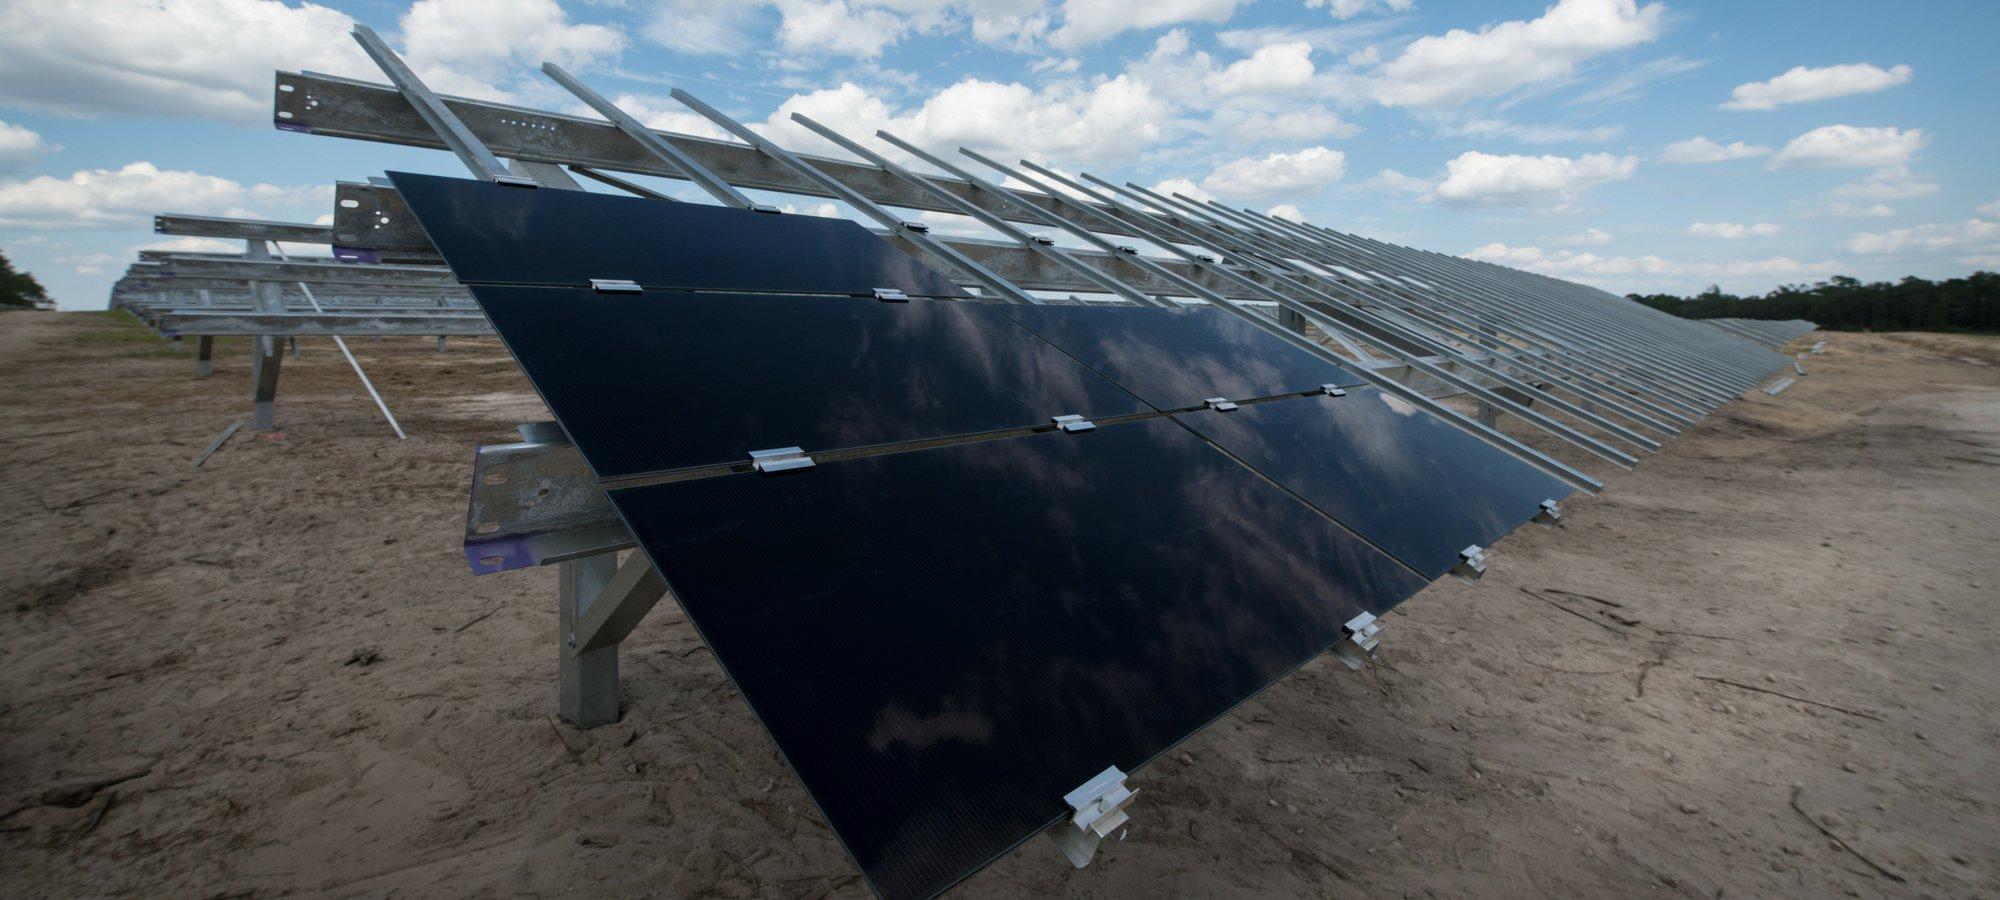 As part of the deal, Origis will sell all energy and renewable attributes of the installation to Georgia Power through Georgia Power's Renewable Energy Development Initiative (REDI) program. Image: Origis Energy